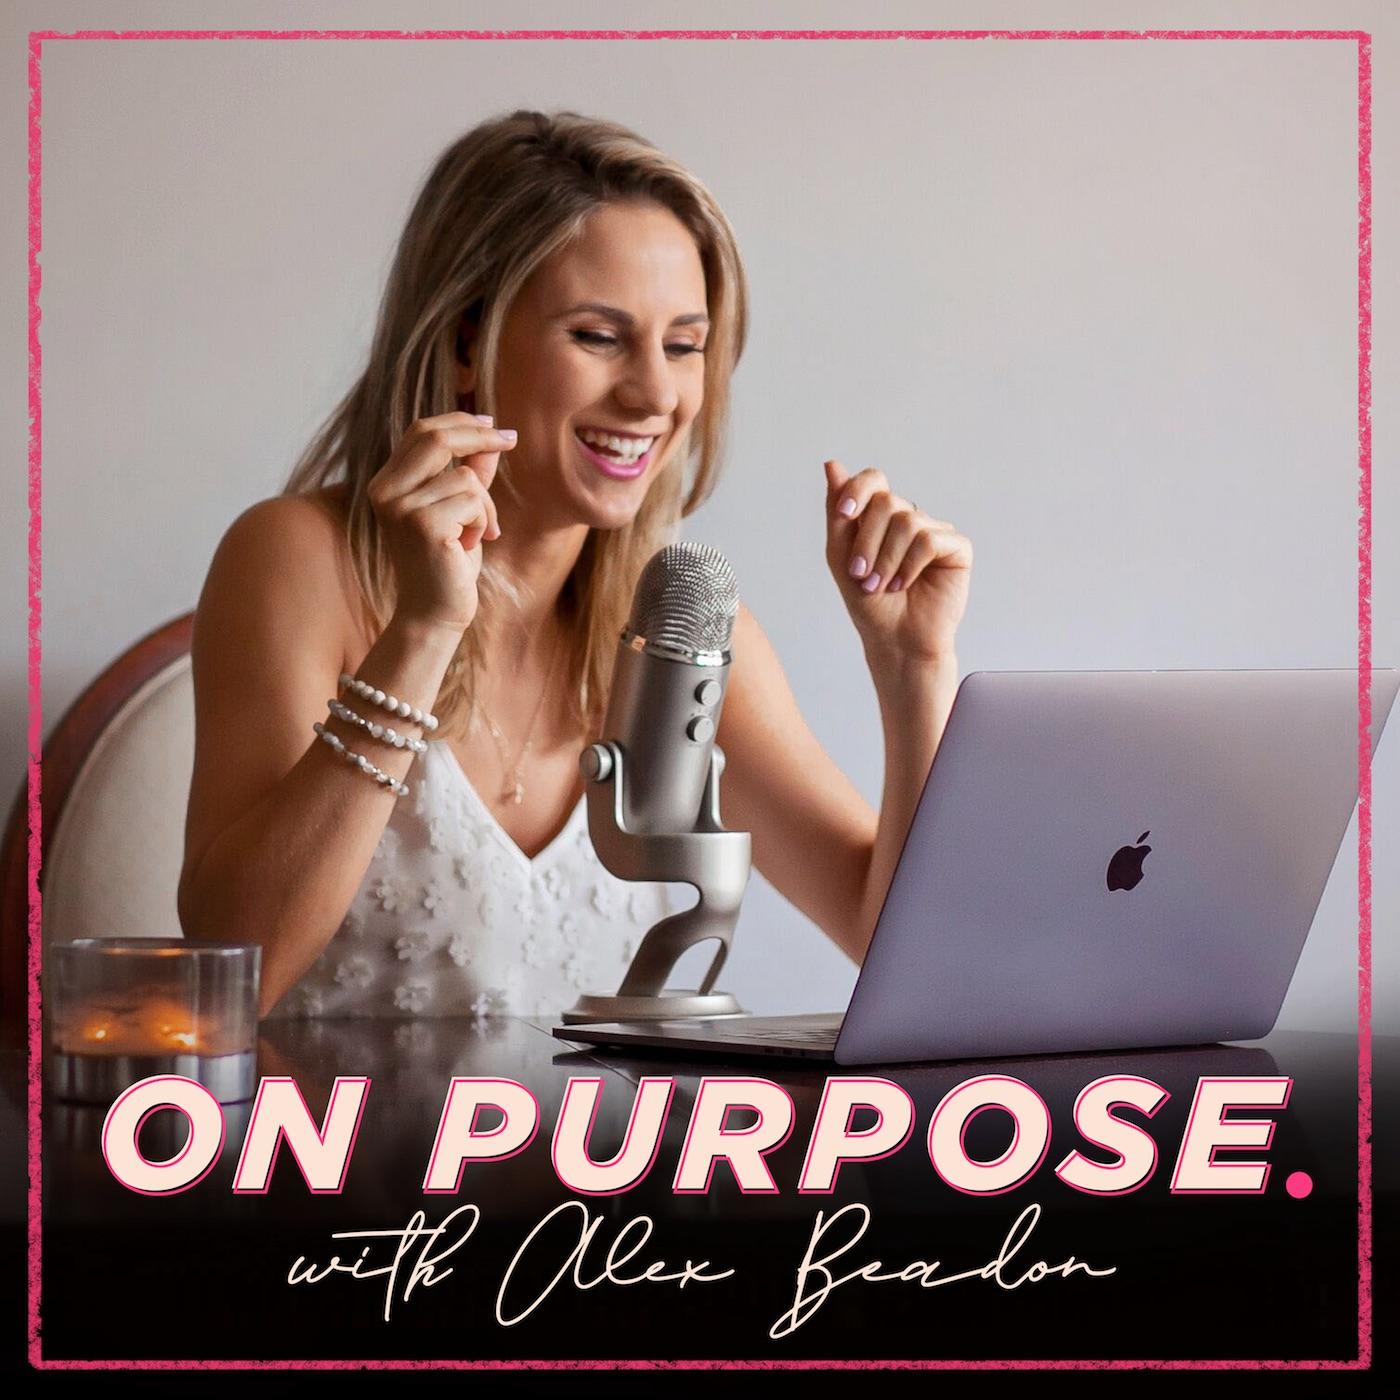 On Purpose With Alex Beadon show art